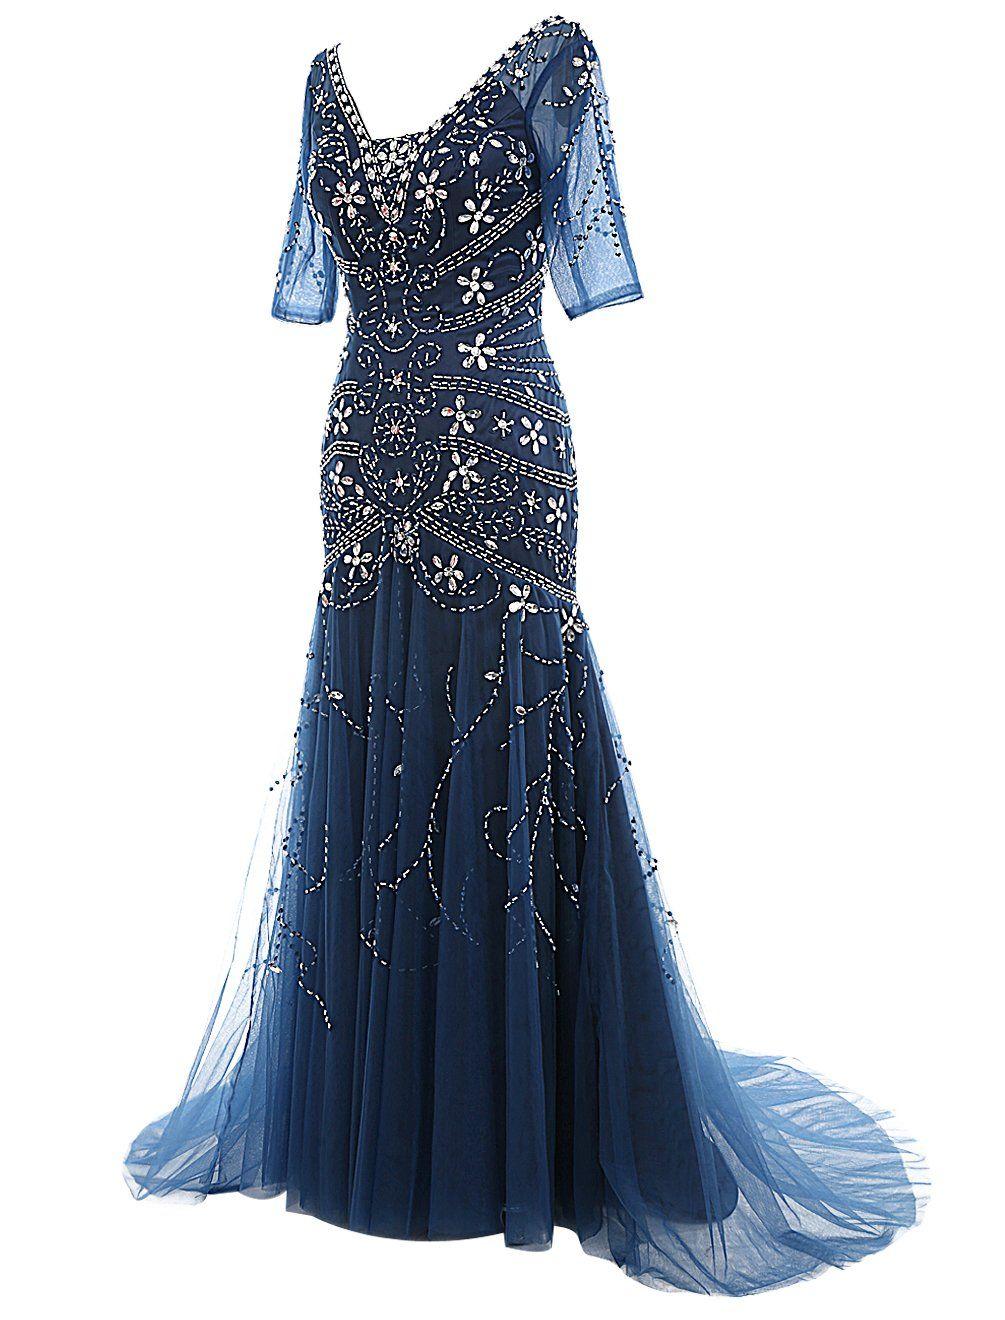 Dressystar v neck long beaded wedding dress mermaid ball gown with